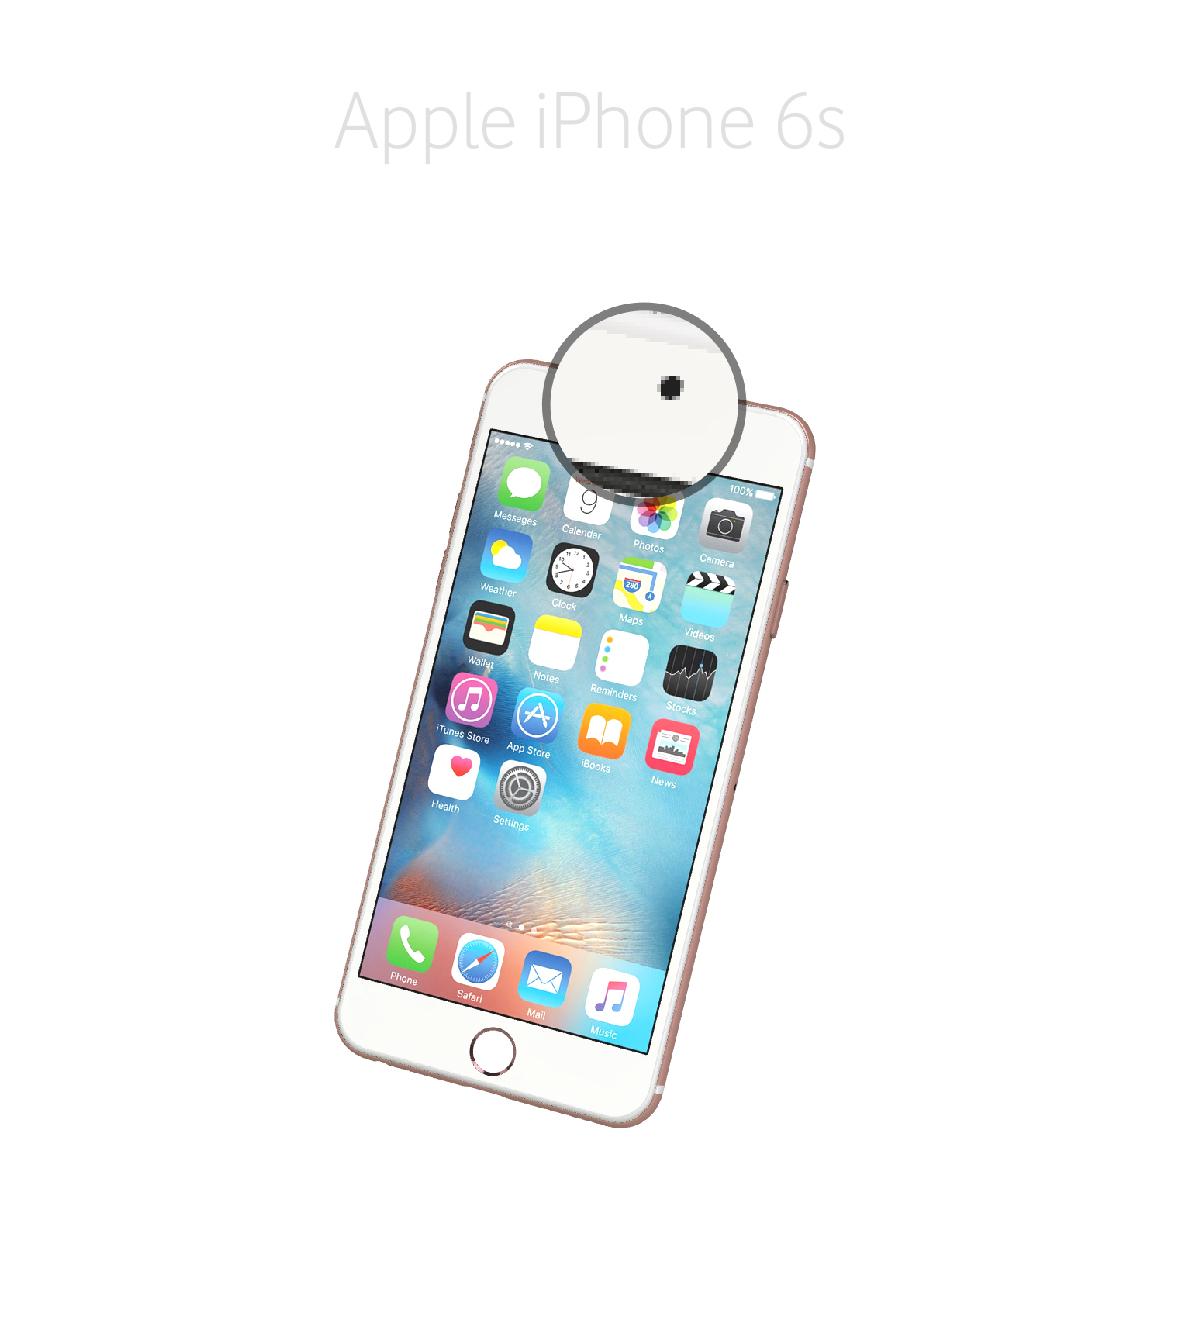 Laga kamera (selfie) iPhone 6s